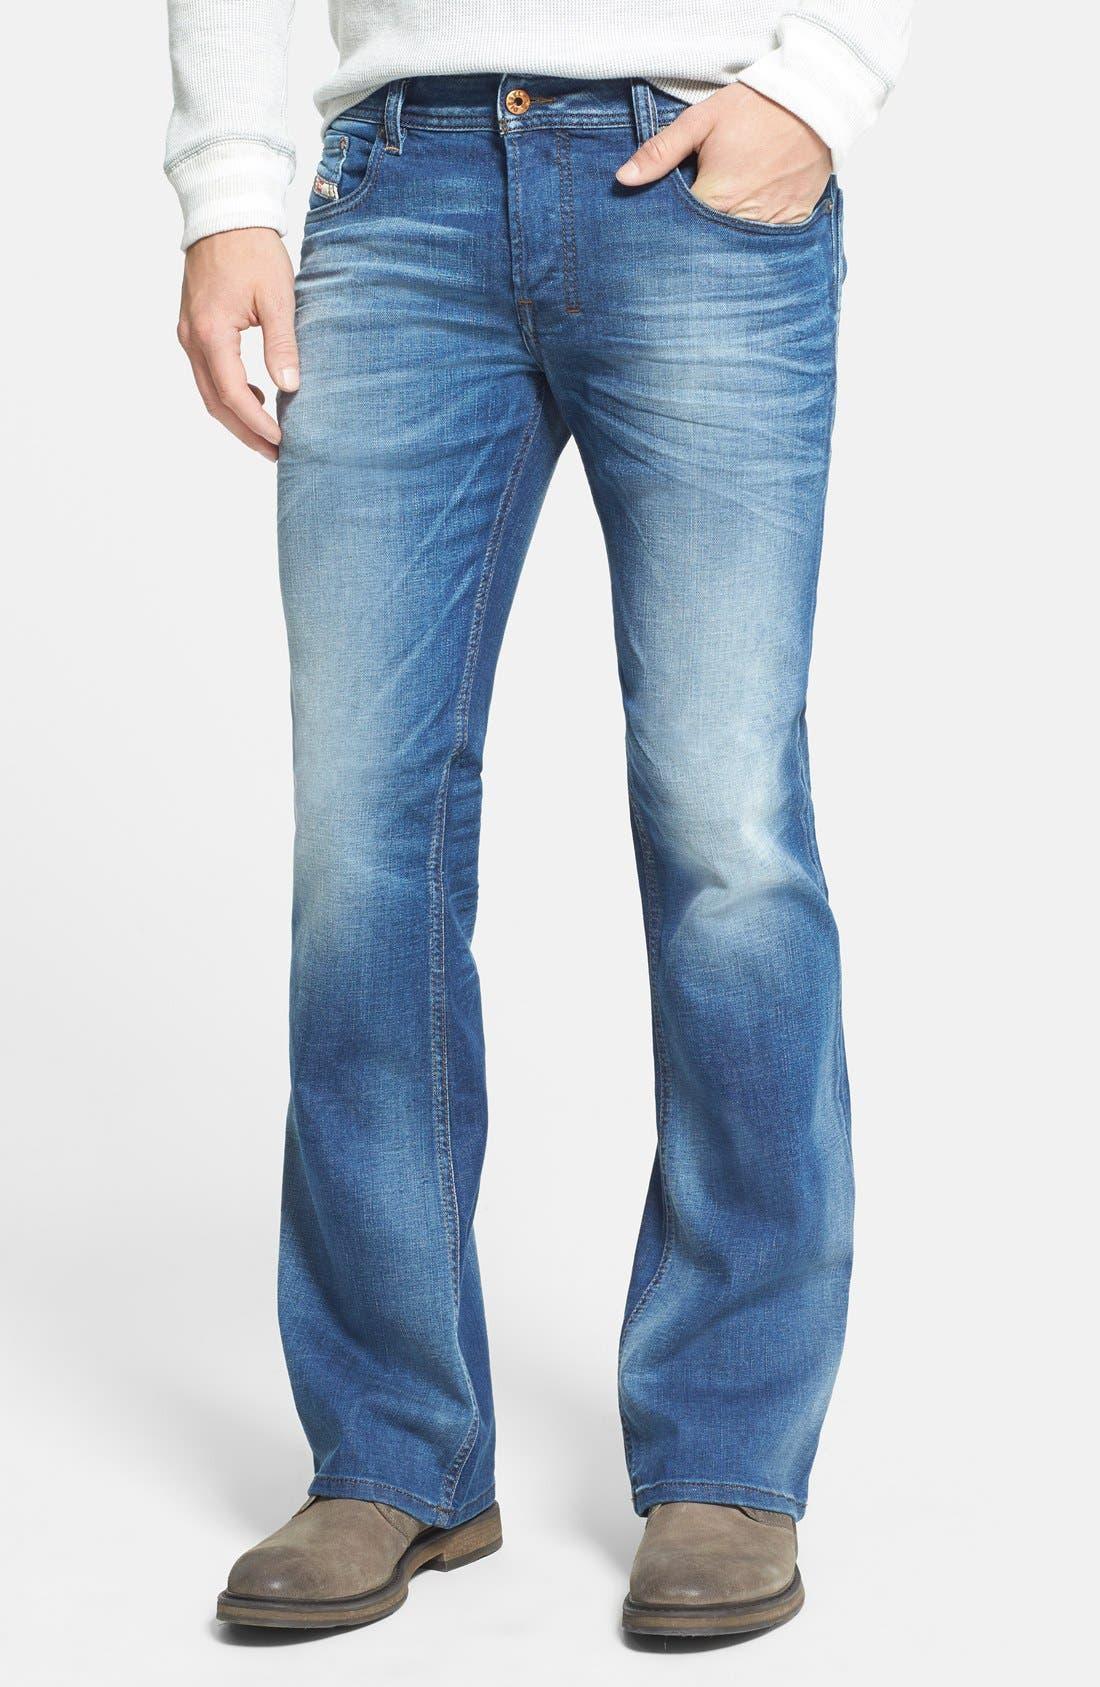 Zathan Bootcut Jeans,                             Main thumbnail 1, color,                             0831D